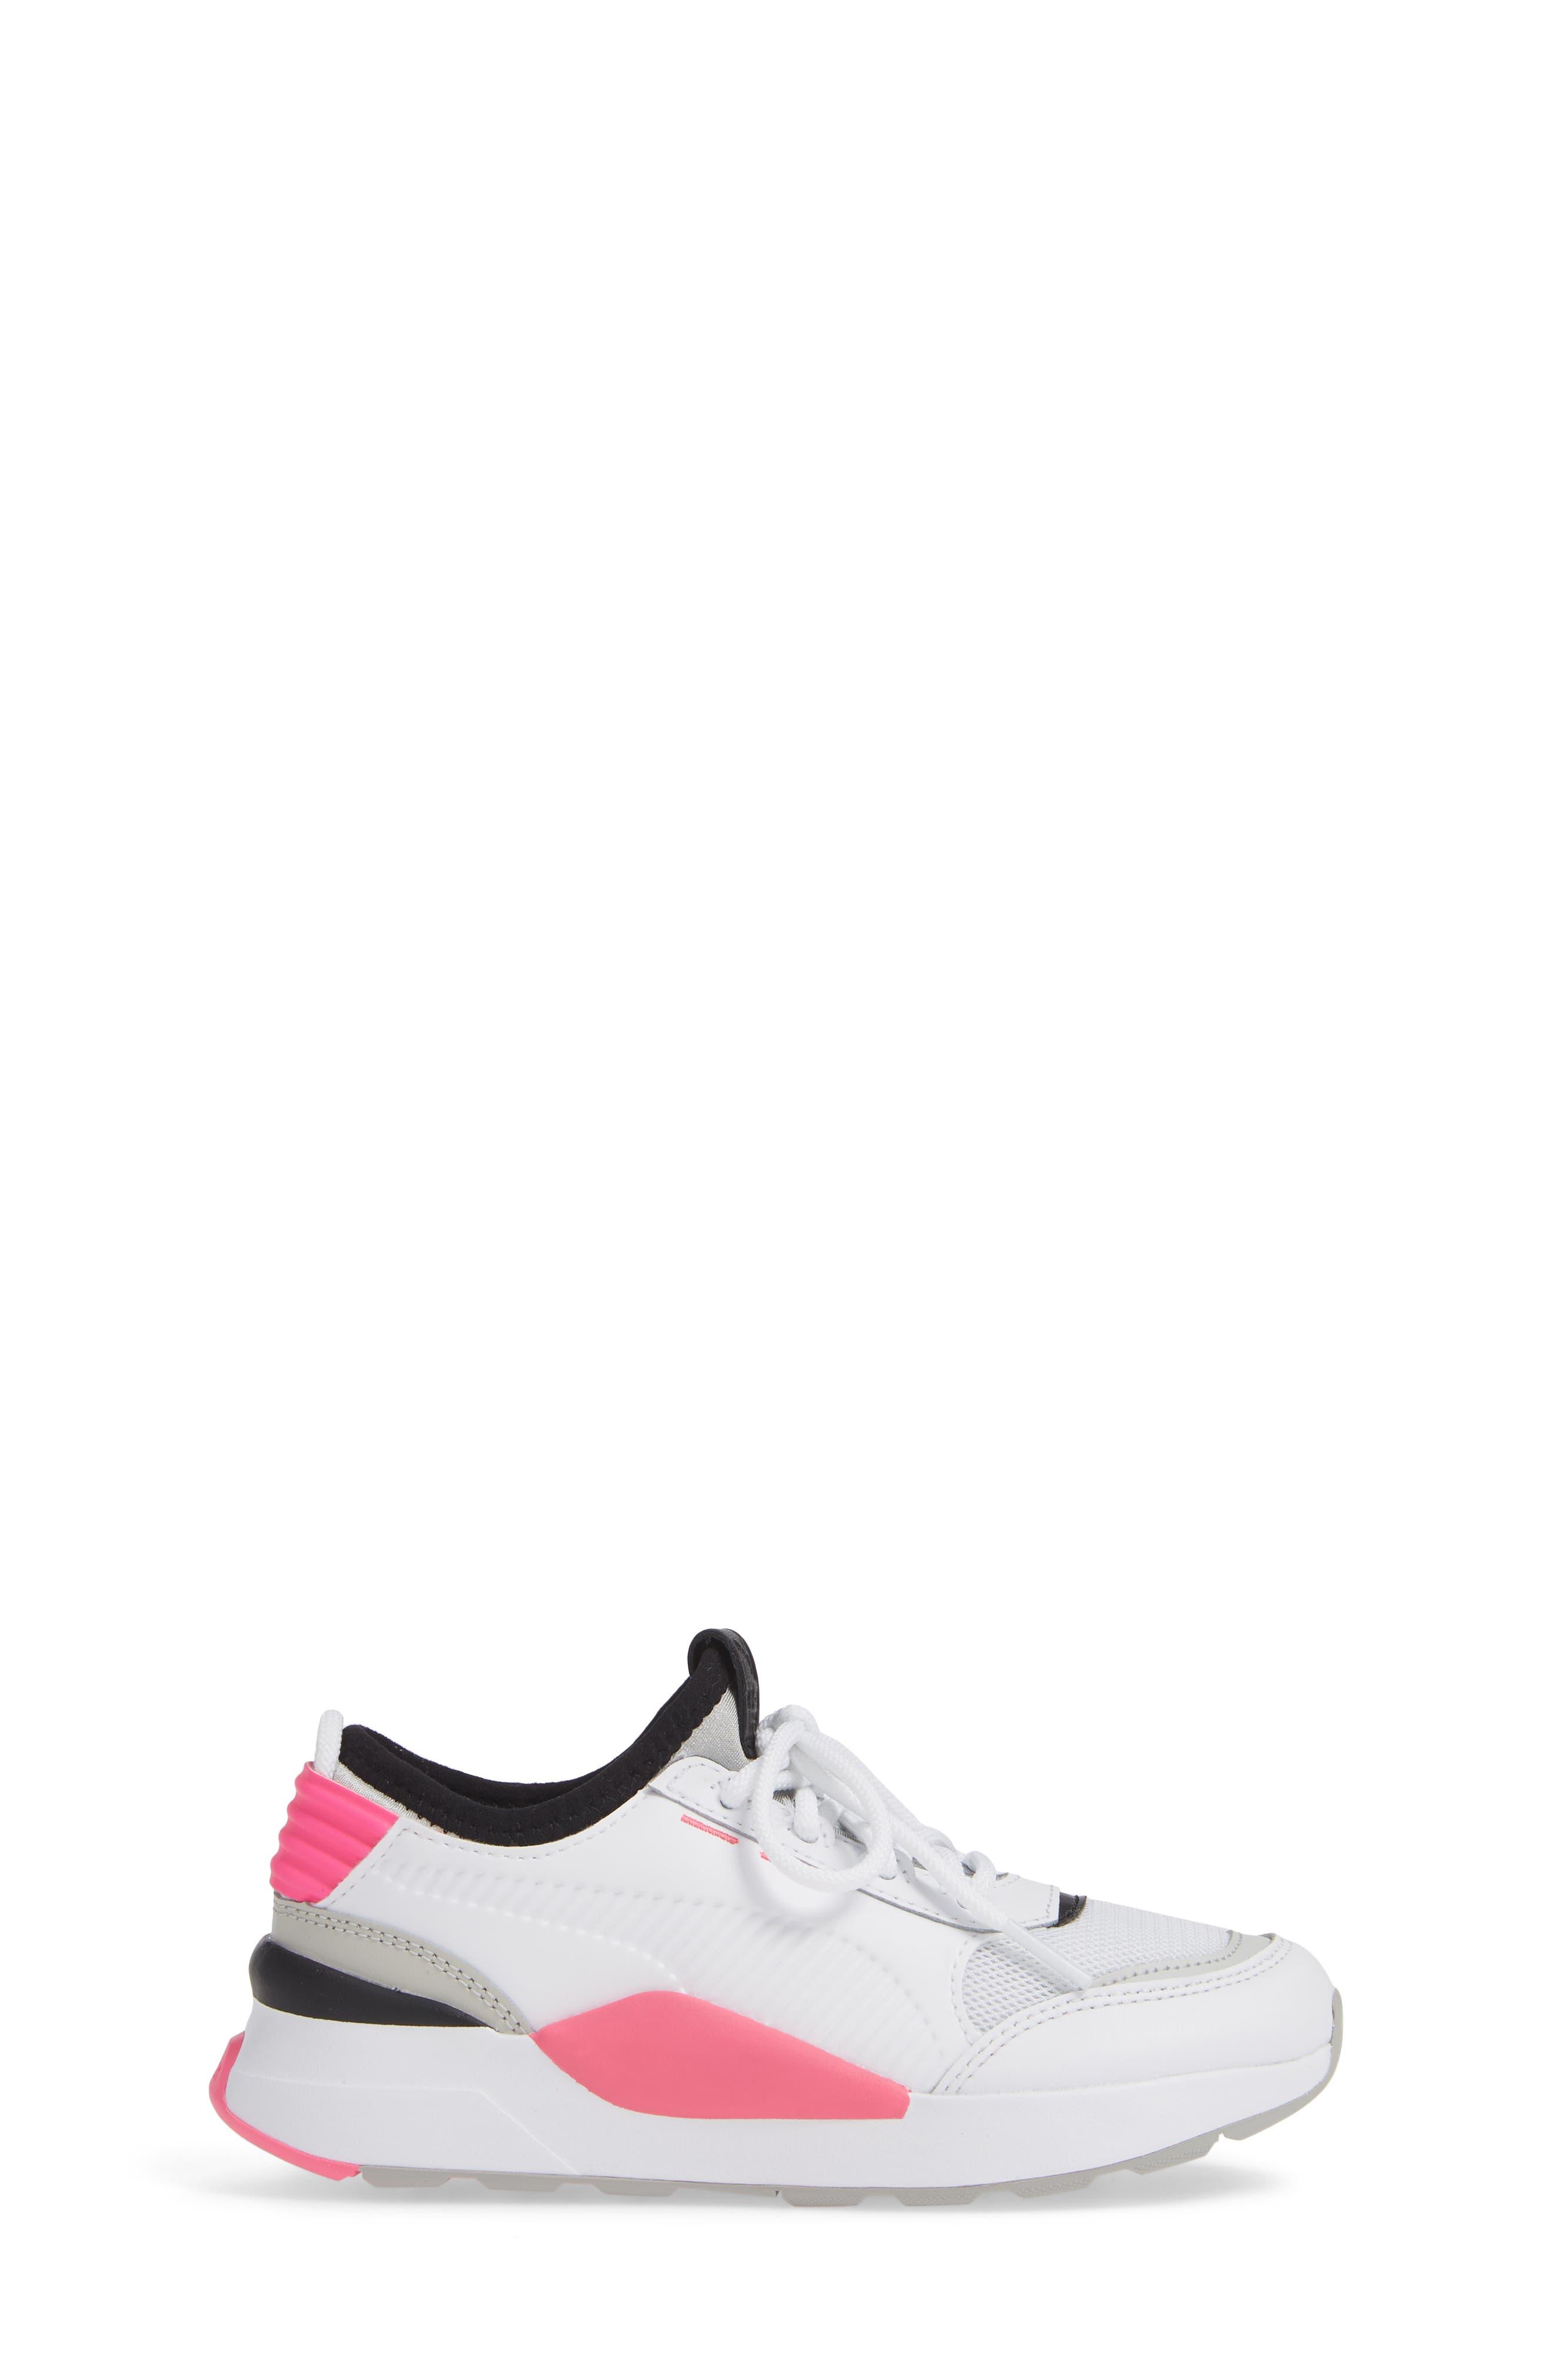 RS-0 Play Sneaker,                             Alternate thumbnail 3, color,                             WHITE/ GRAY VIOLET